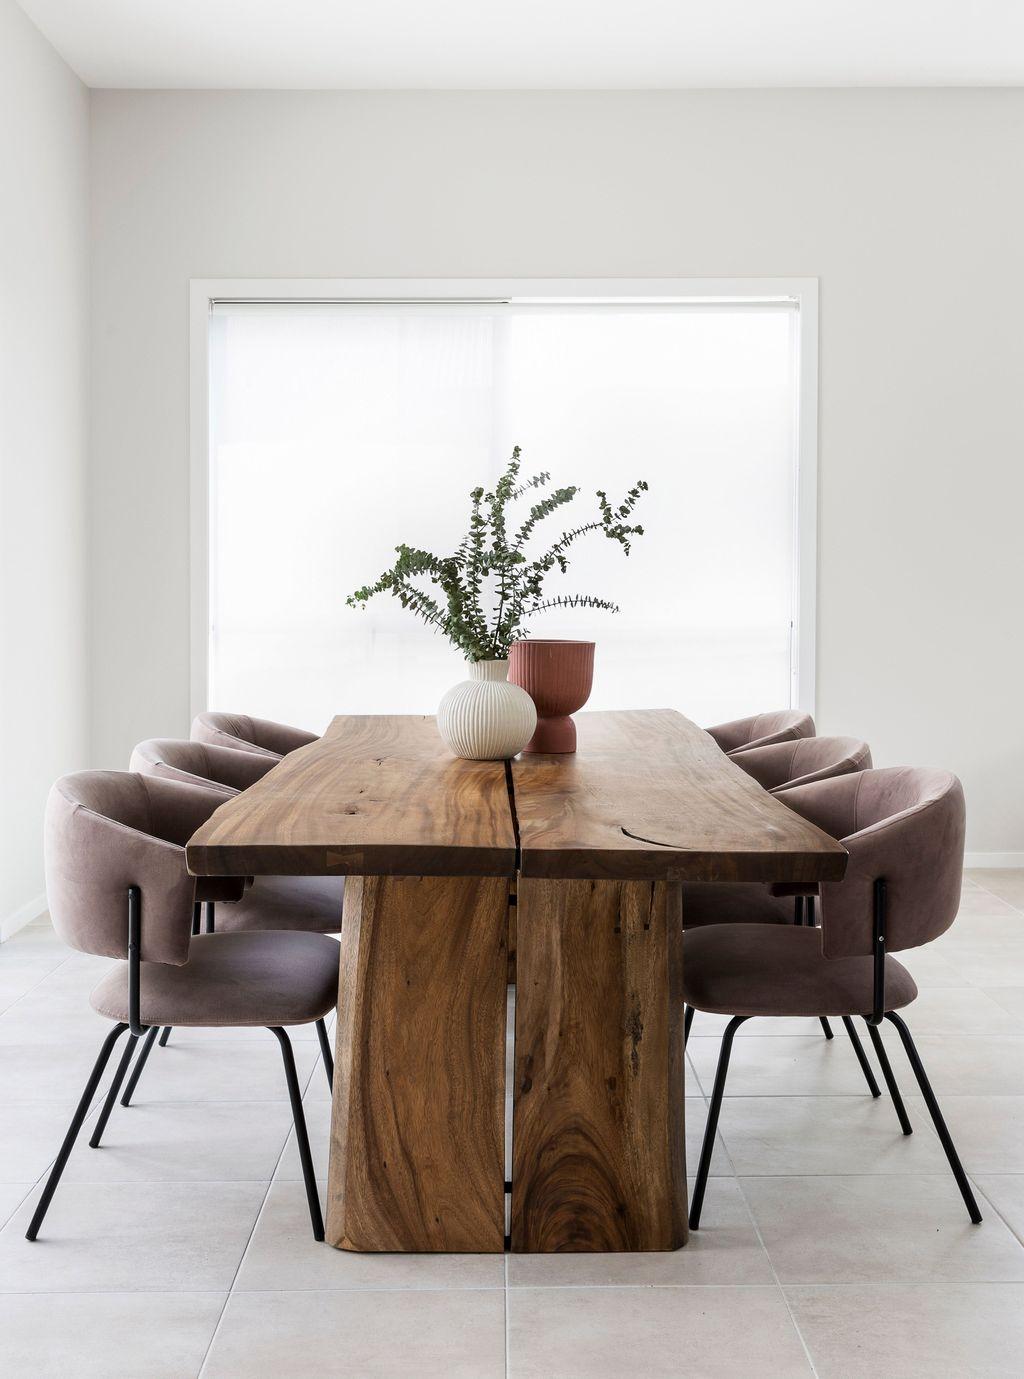 Popular Modern Dining Room Design Ideas You Should Copy 23